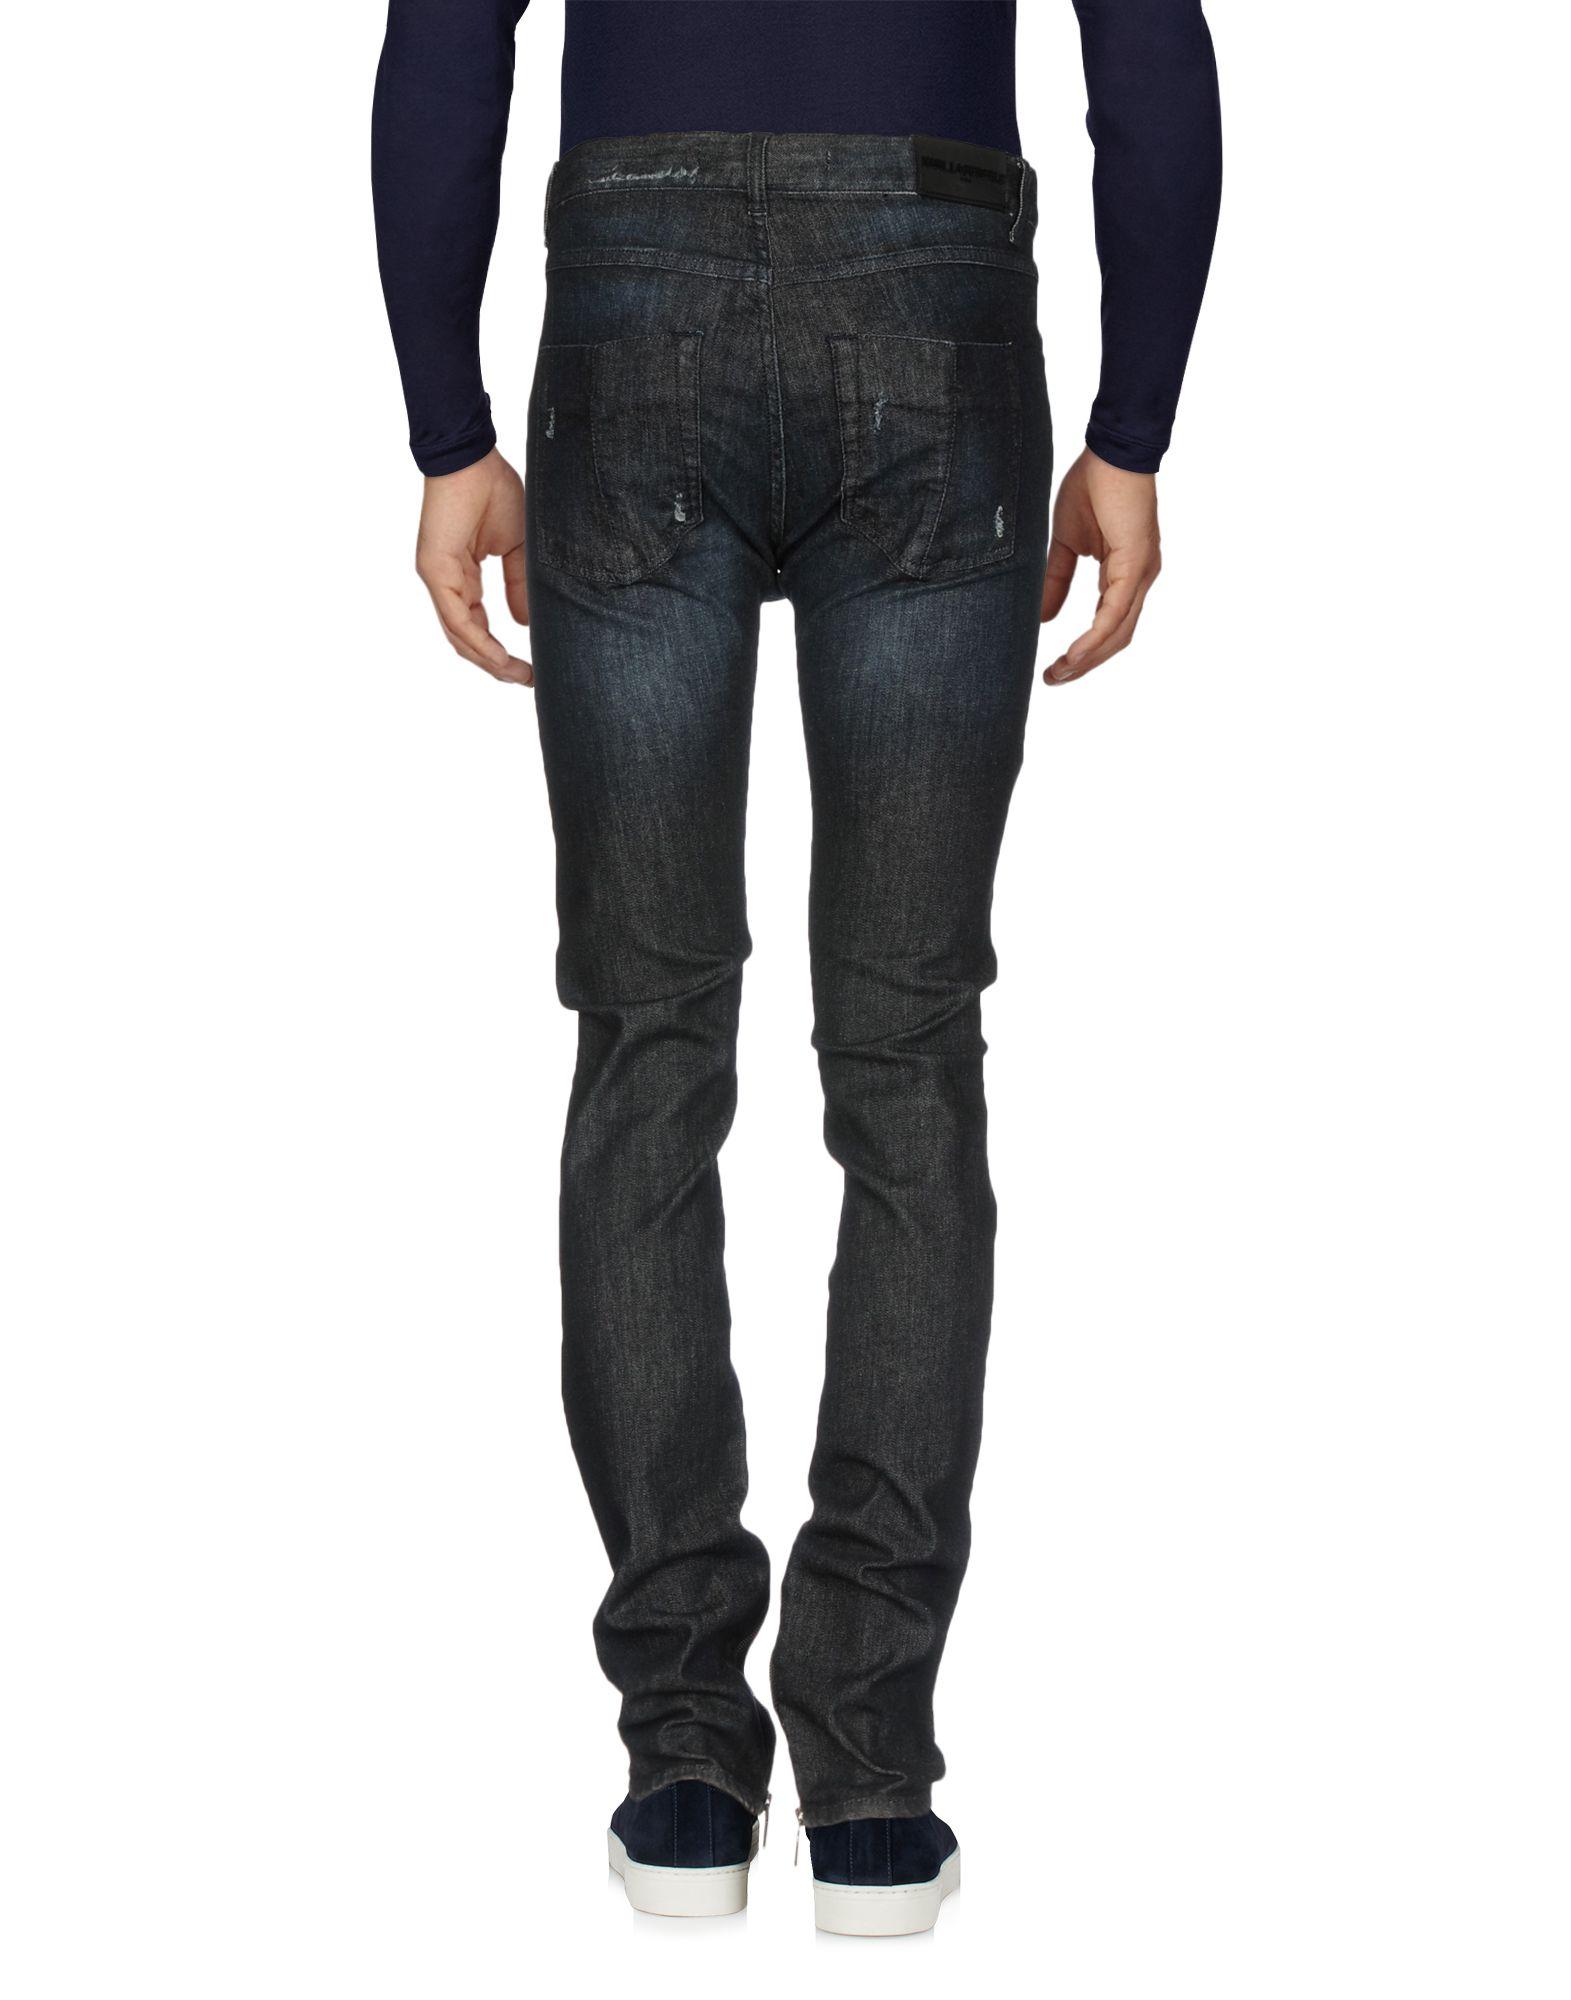 Pantaloni Jeans Jeans Jeans Karl Lagerfeld Uomo - 42669633NW c568c4